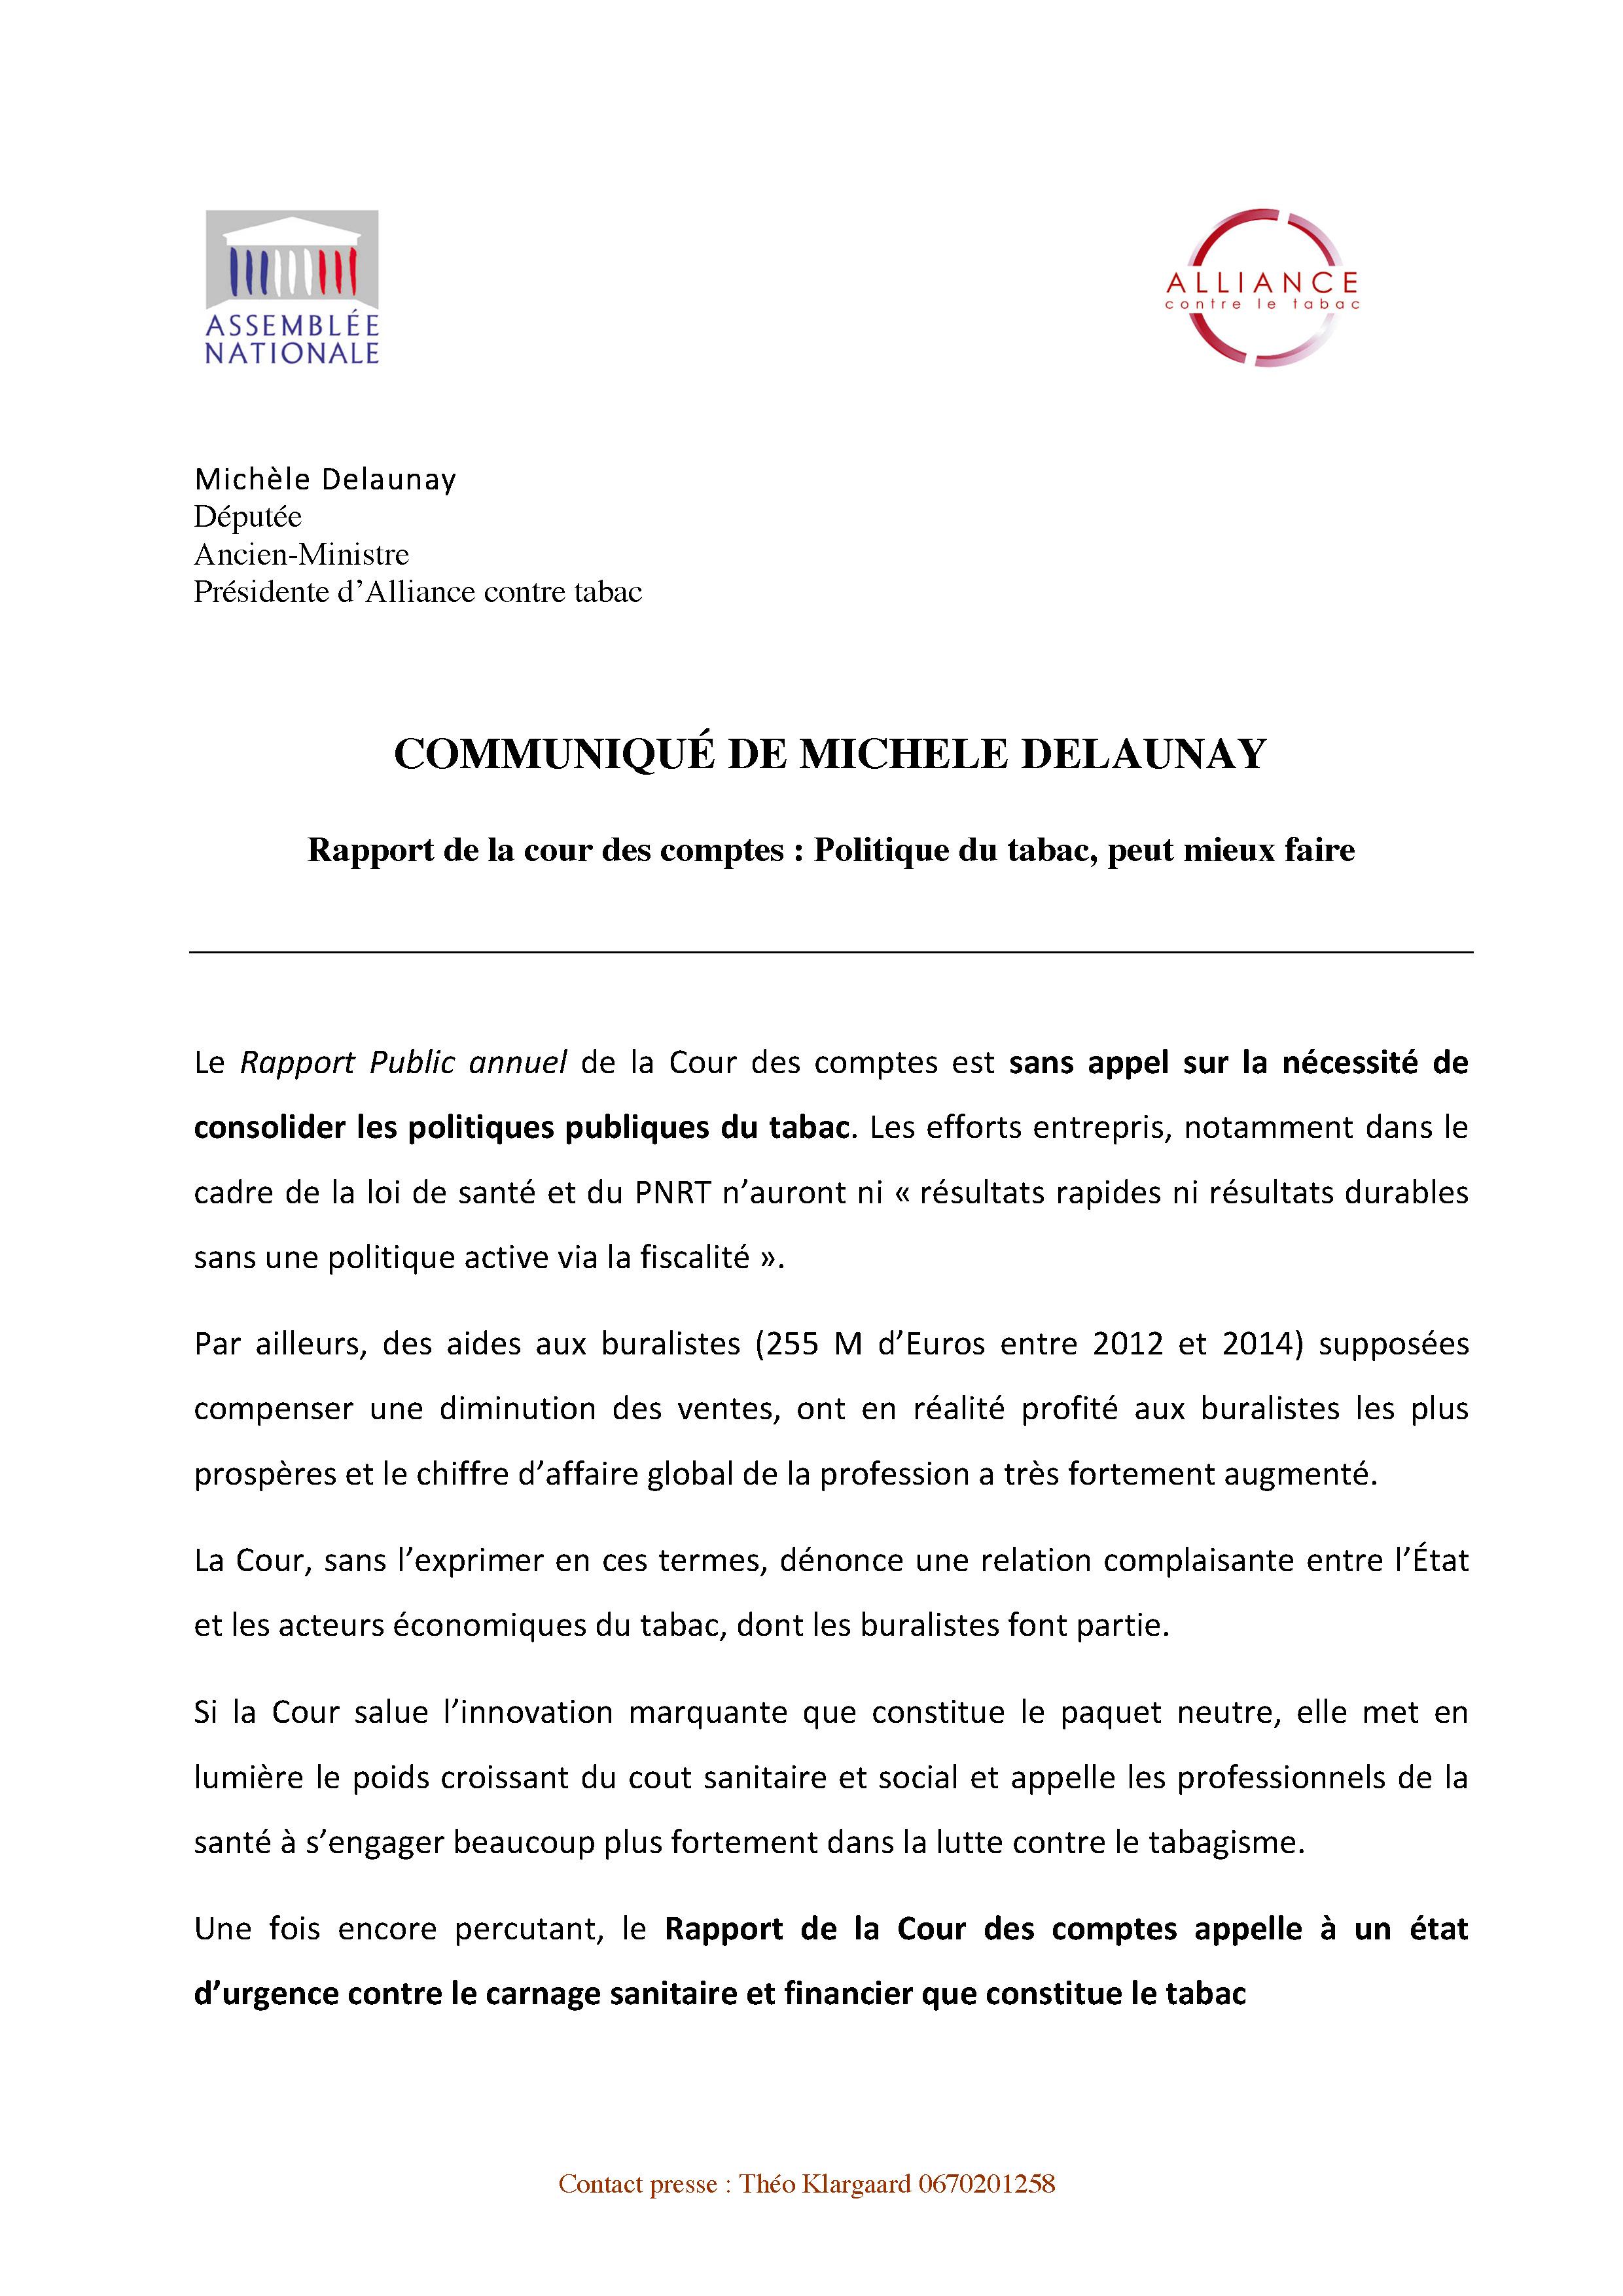 Alliance-CP_rapport-cour-des-comptes-10fev2016.jpg